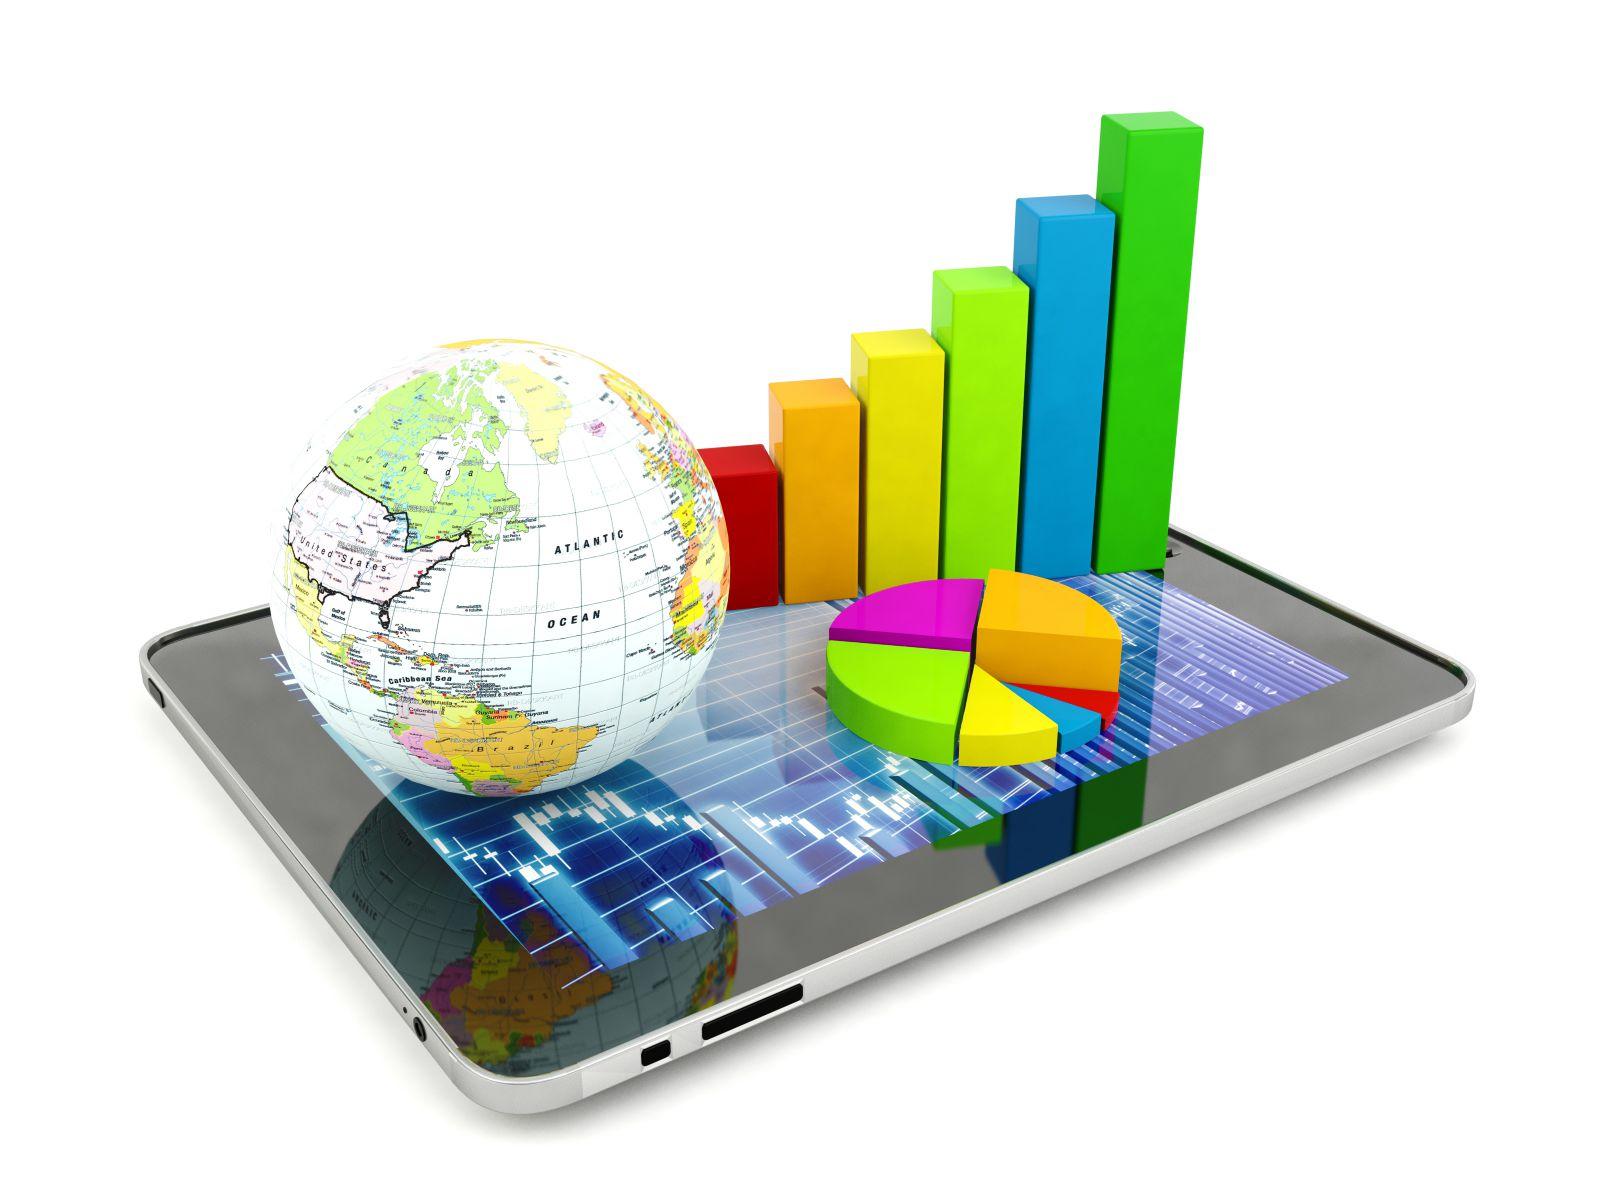 Tablet Business Intelligence